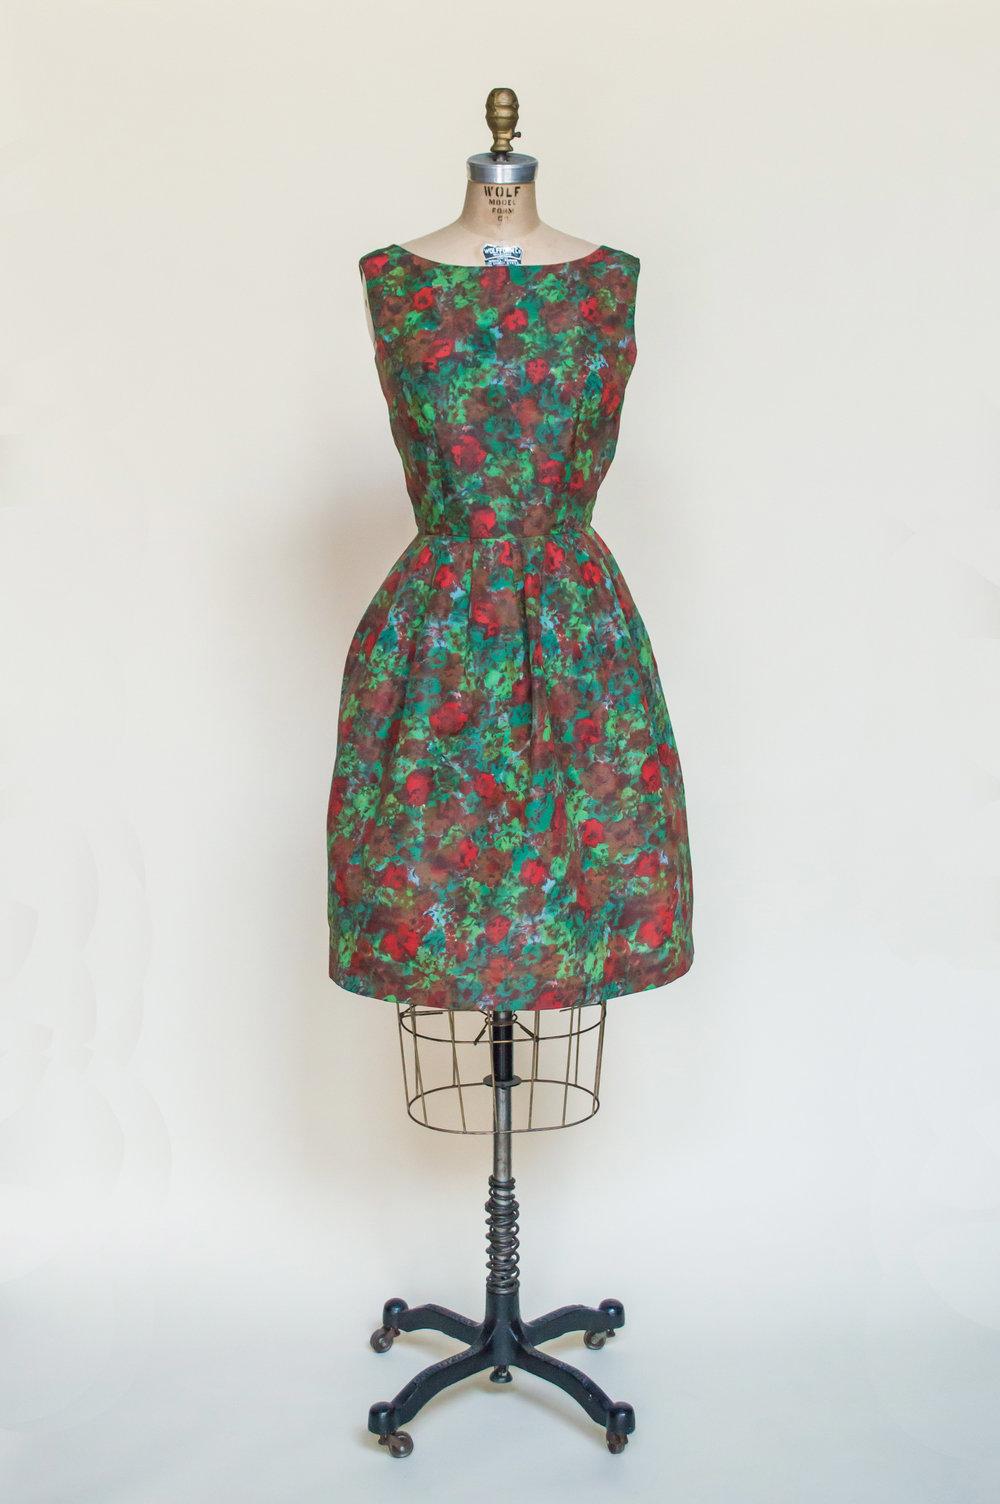 1960s-red-floral-dress-01.jpg